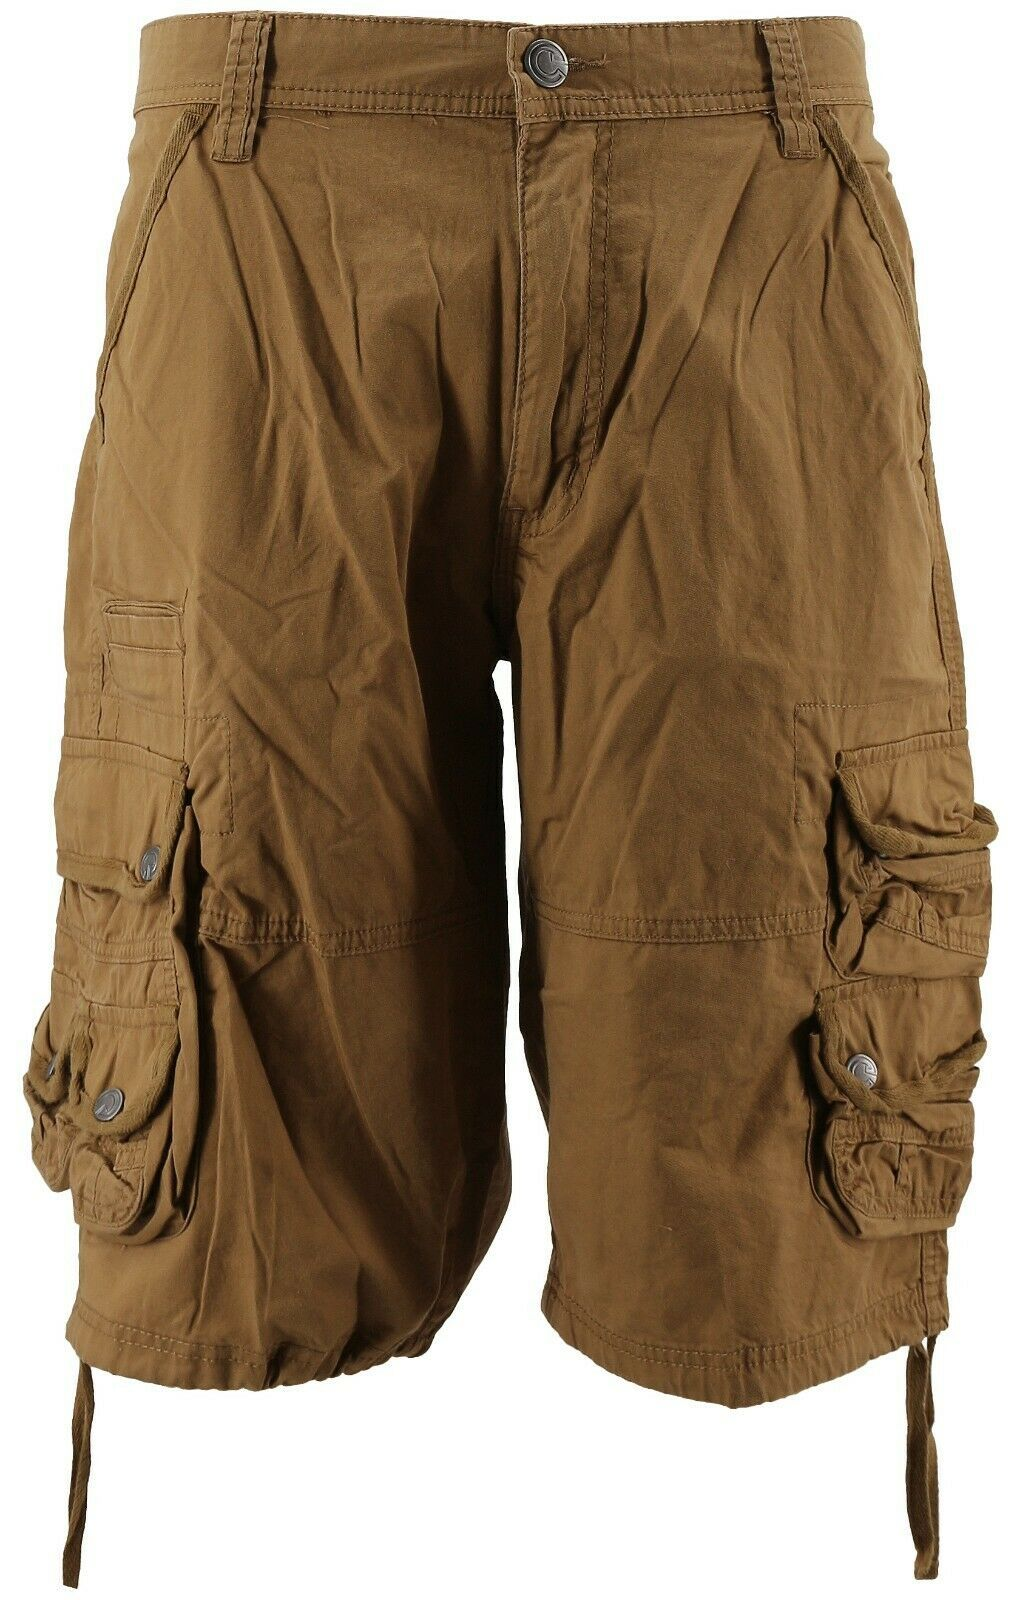 MSLM Men's Relaxed Fit Multi Pocket Cargo Shorts Brown Khaki